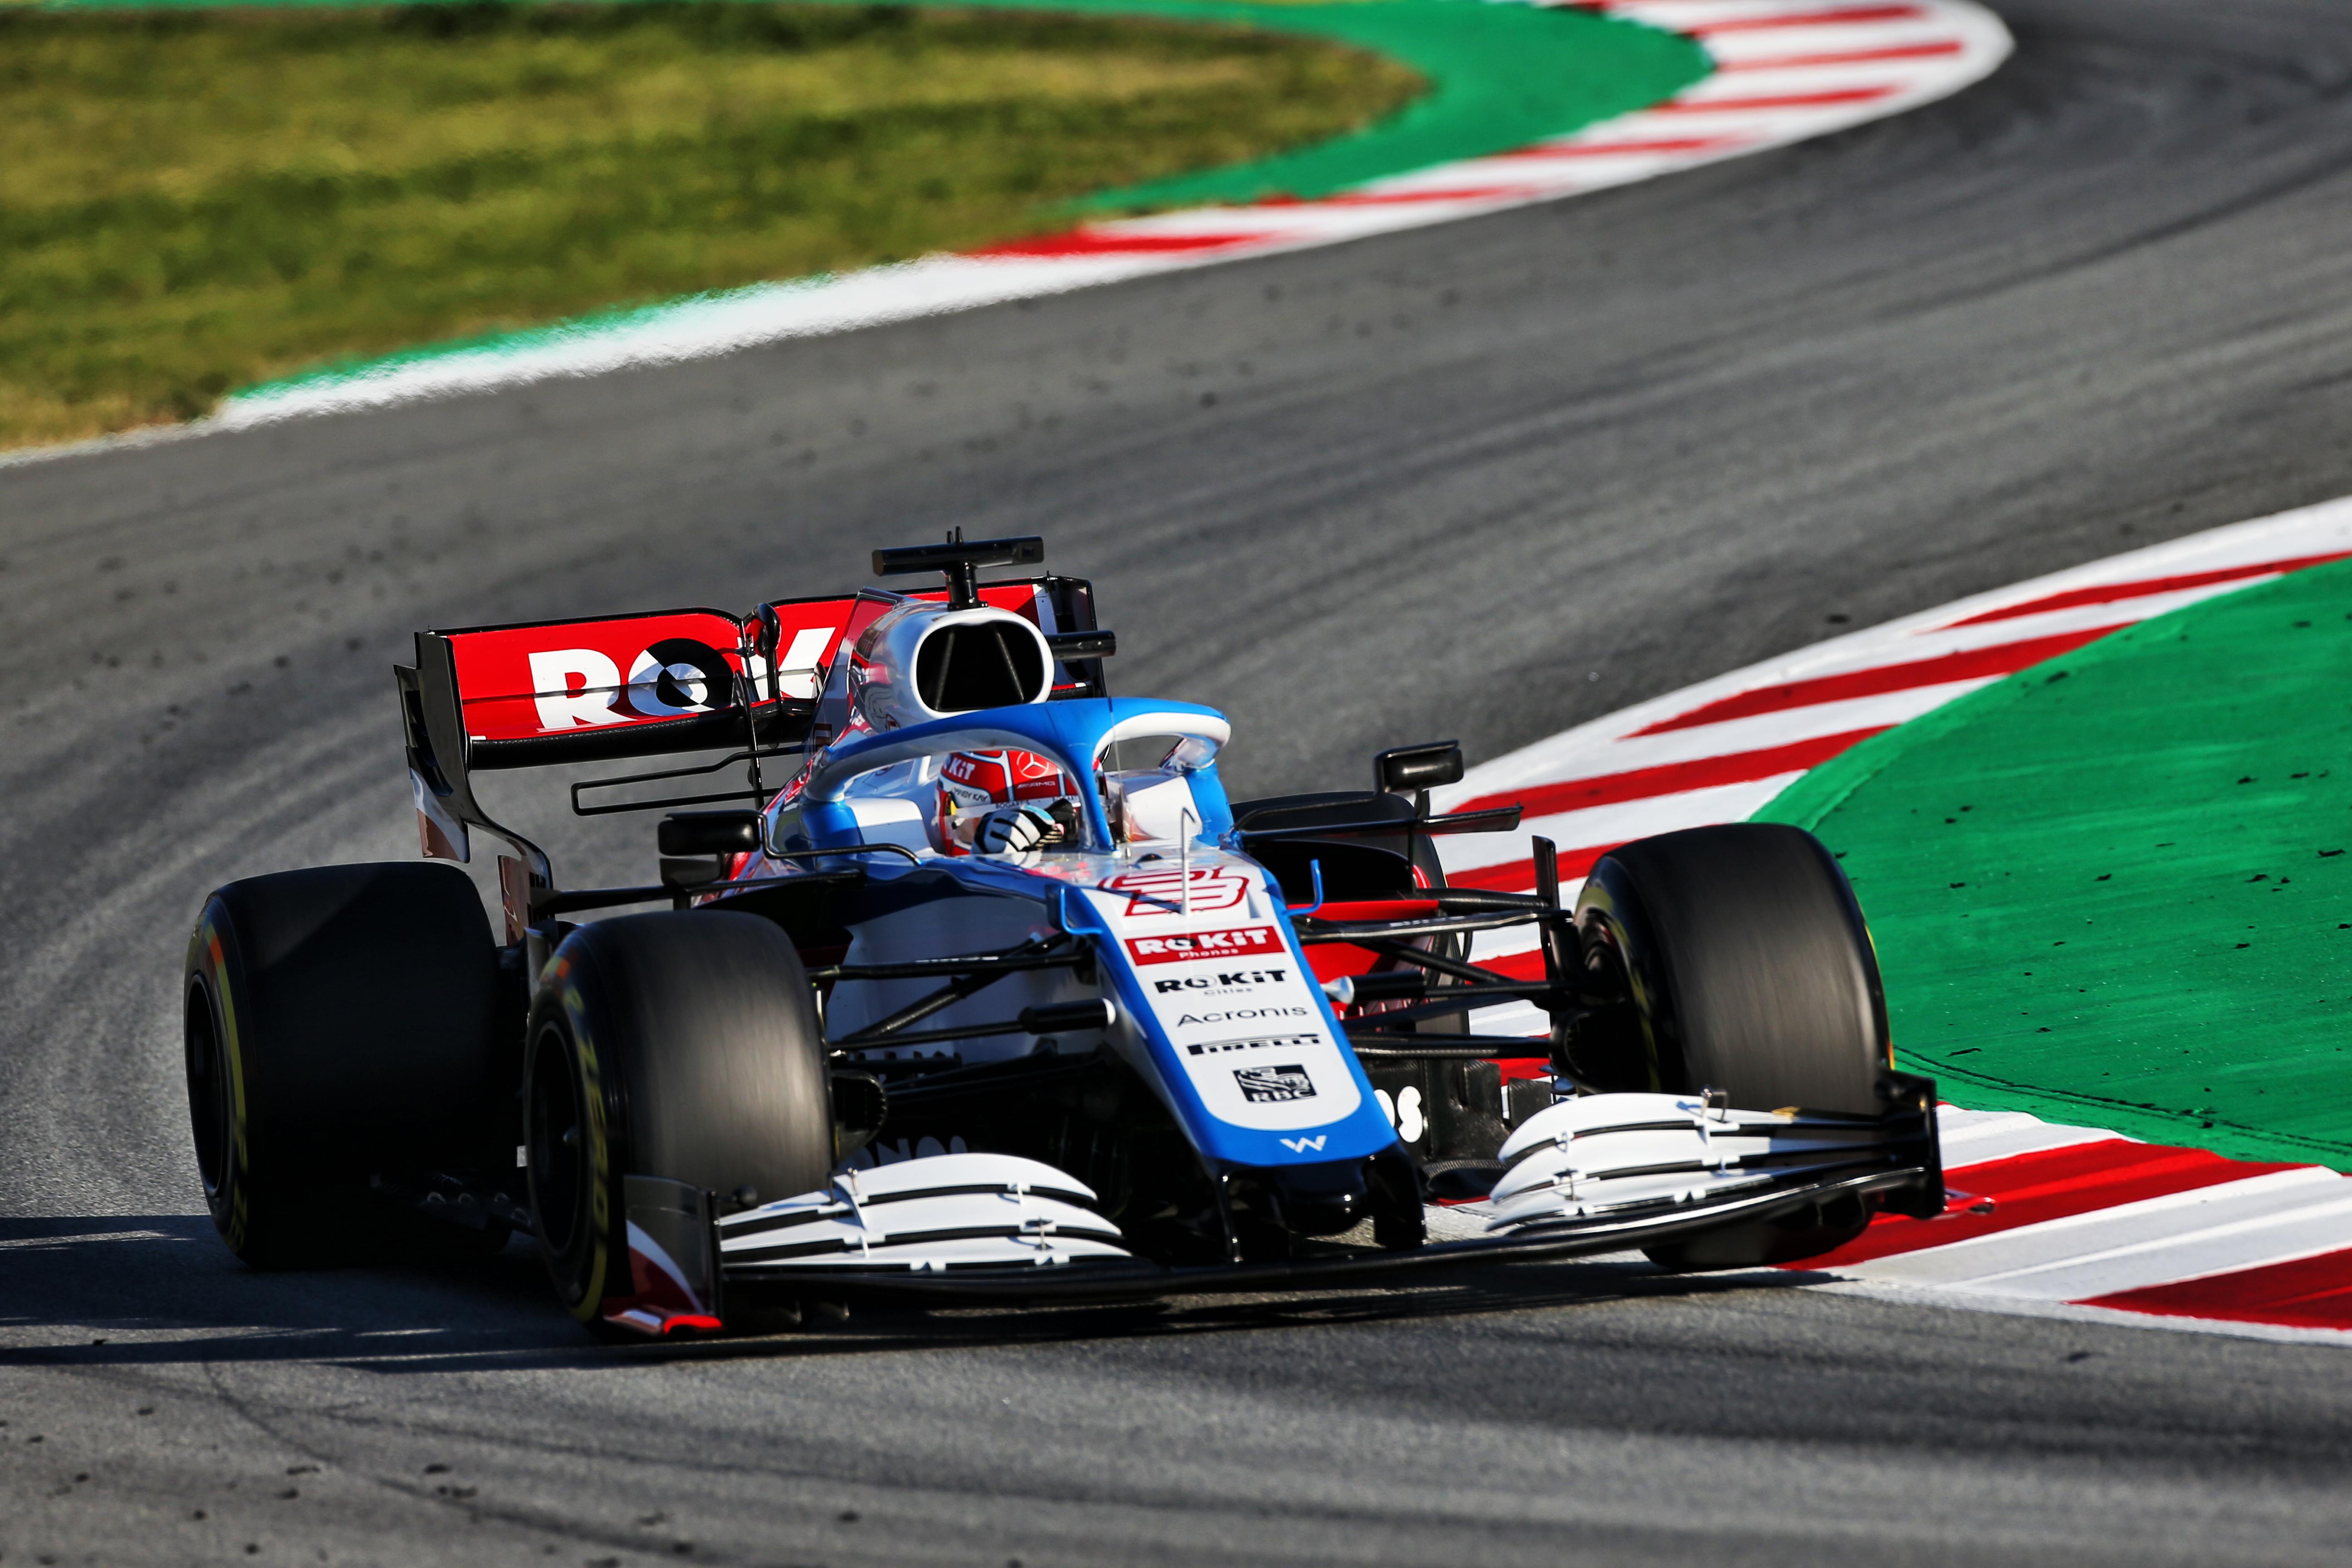 Motor Racing Formula One Testing Test One Day 2 Barcelona, Spain